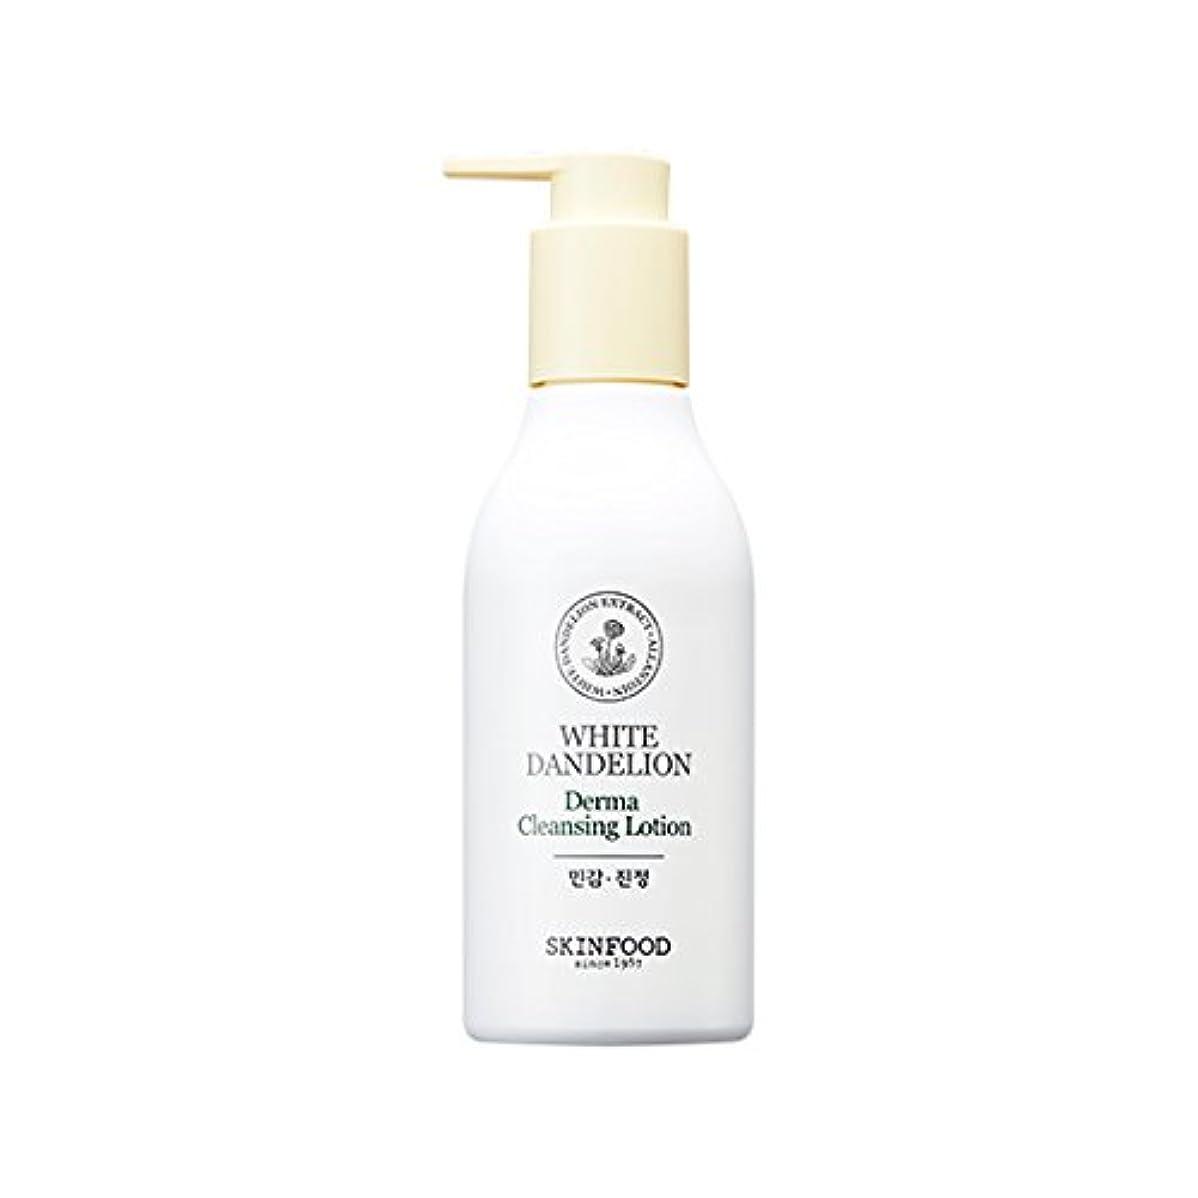 Skinfood/White Dandelion Derma Cleansing Lotion/ホワイトタンポポダーマクレンジングローション/200ml [並行輸入品]